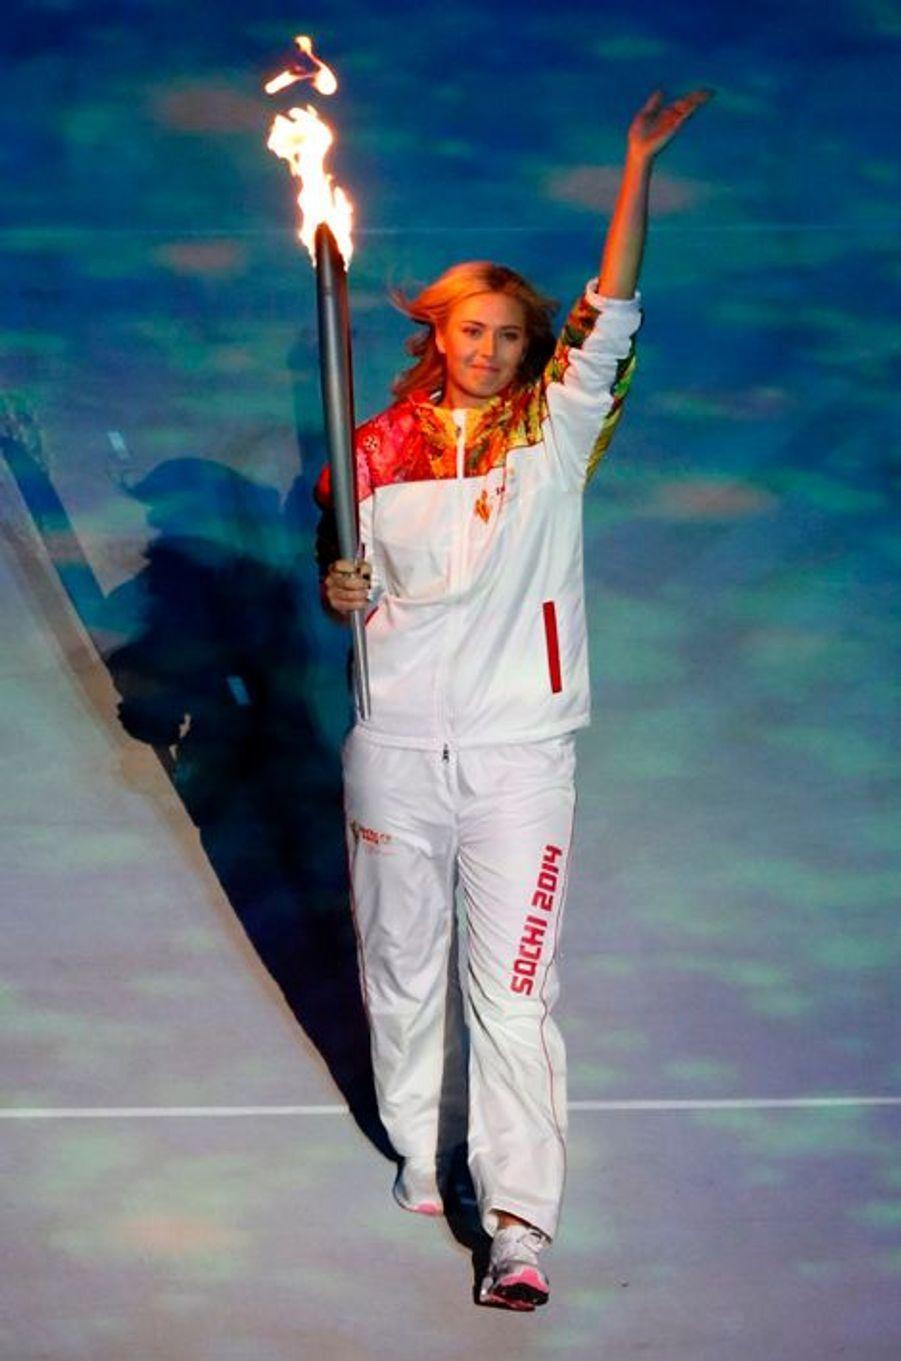 Maria Sharapova a fait entrer la flamme dans le stade...